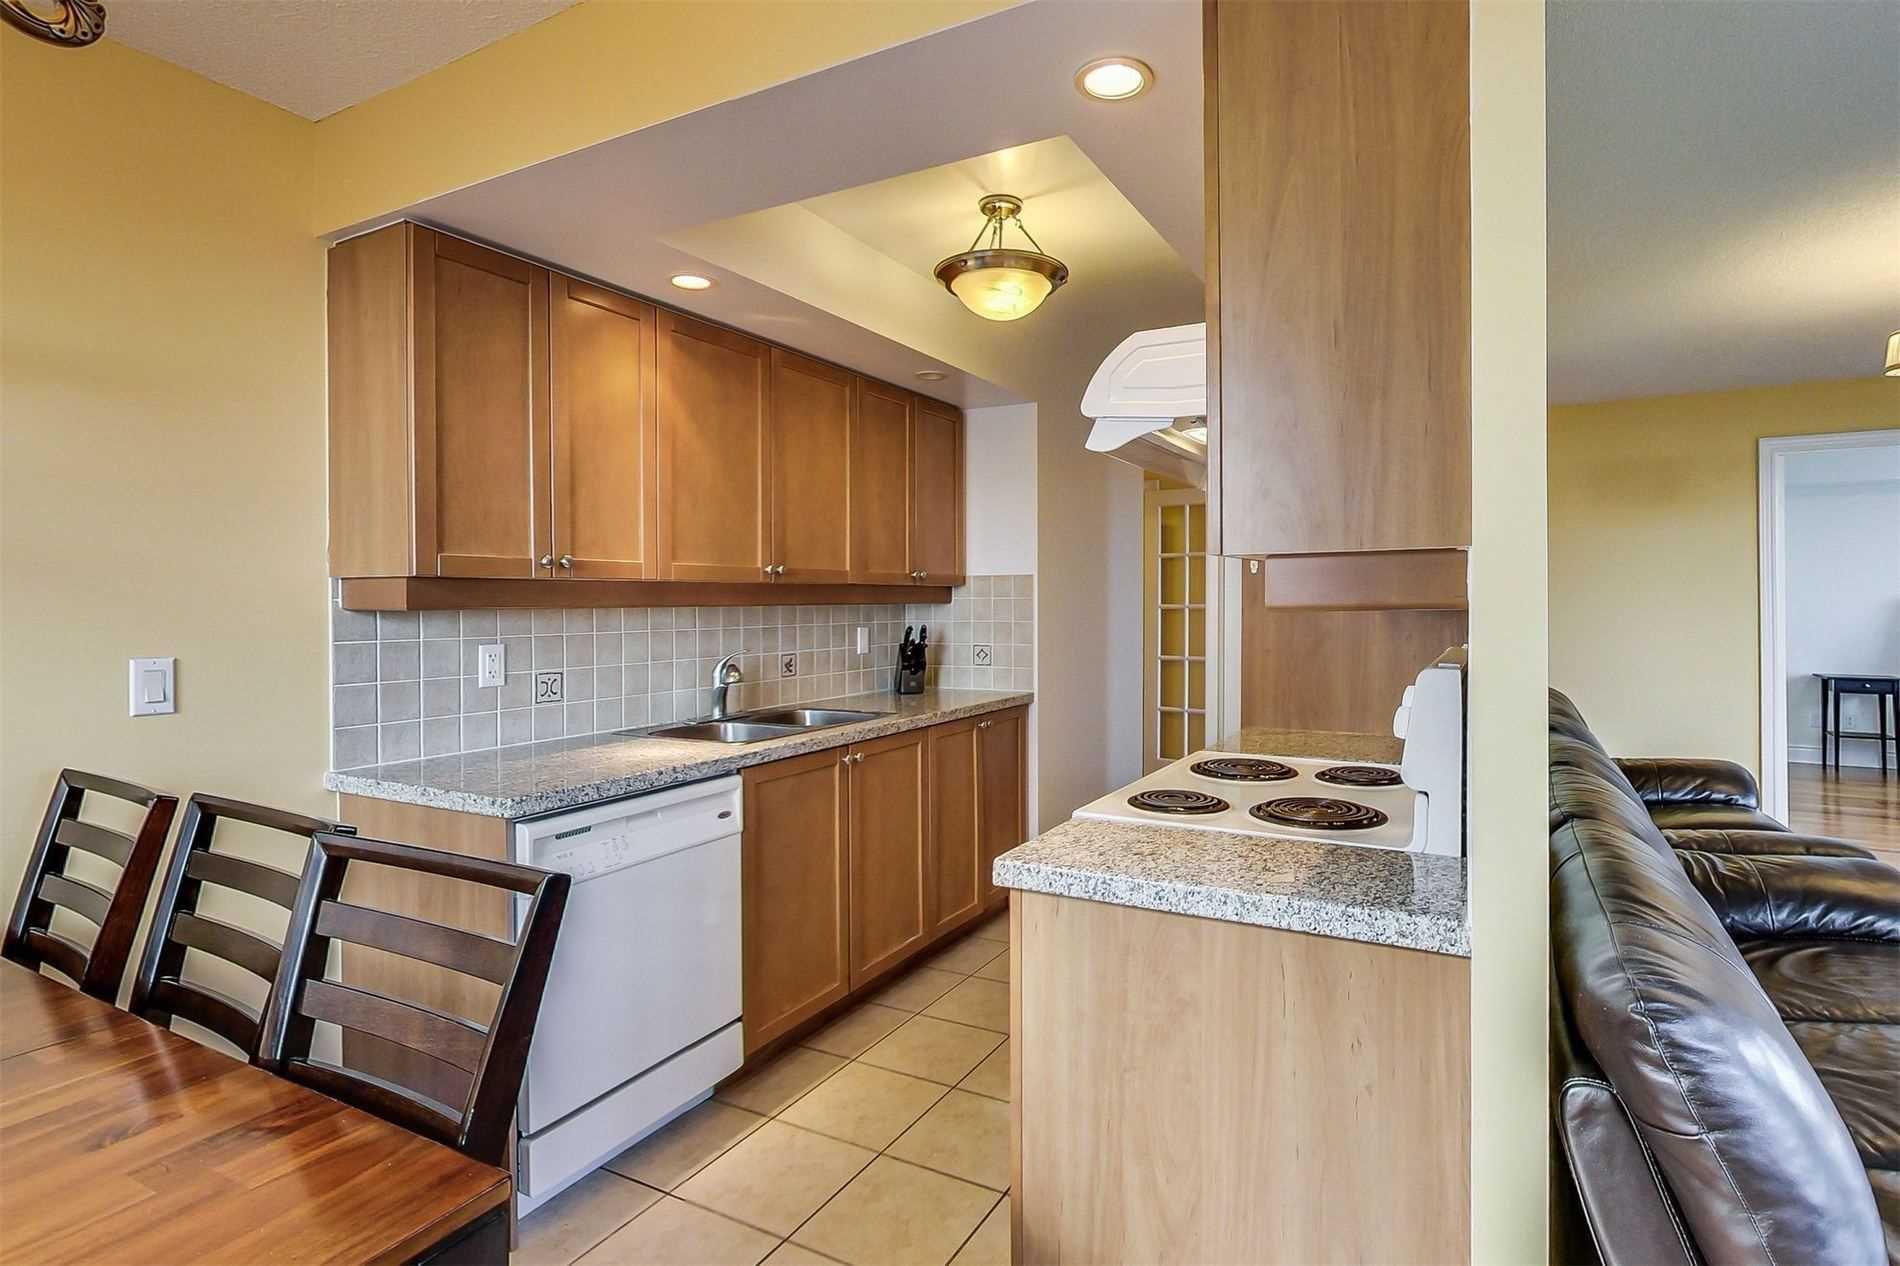 Photo 10: Photos: 1204 10 Northtown Way in Toronto: Willowdale East Condo for sale (Toronto C14)  : MLS®# C4648371